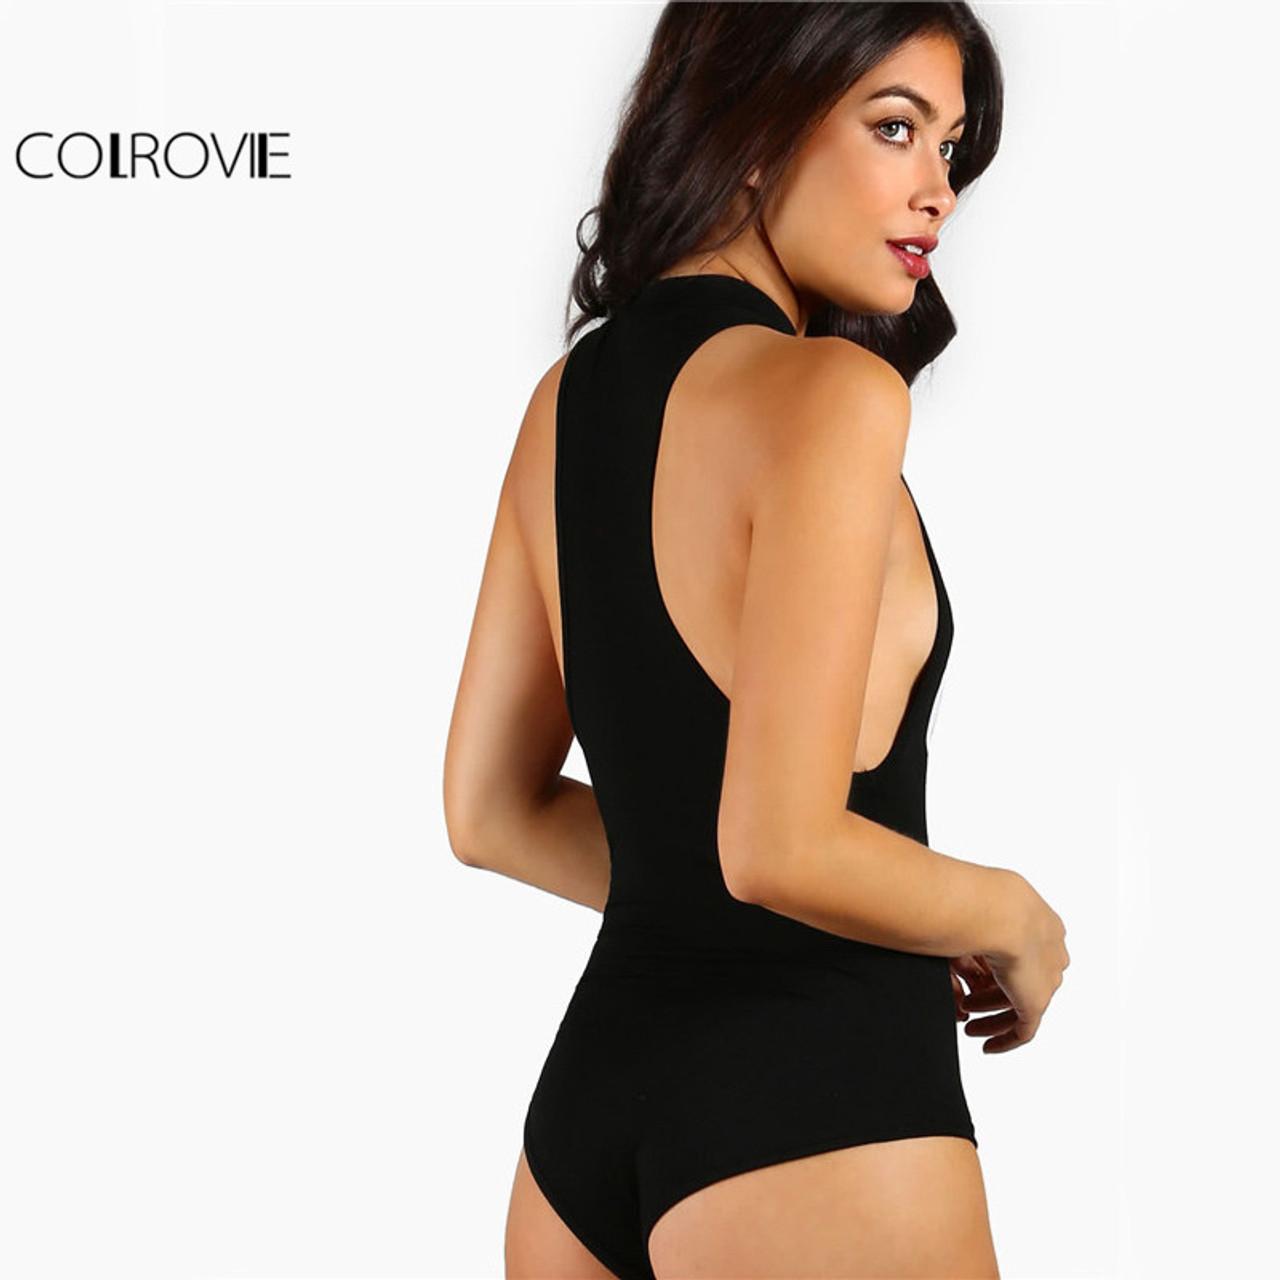 57bb5f8822aa ... COLROVIE Mock Neck Racerback Bodysuit Black Sexy Skinny Women Letter  Print Slim Bodysuits 2017 Summer Sleeveless ...